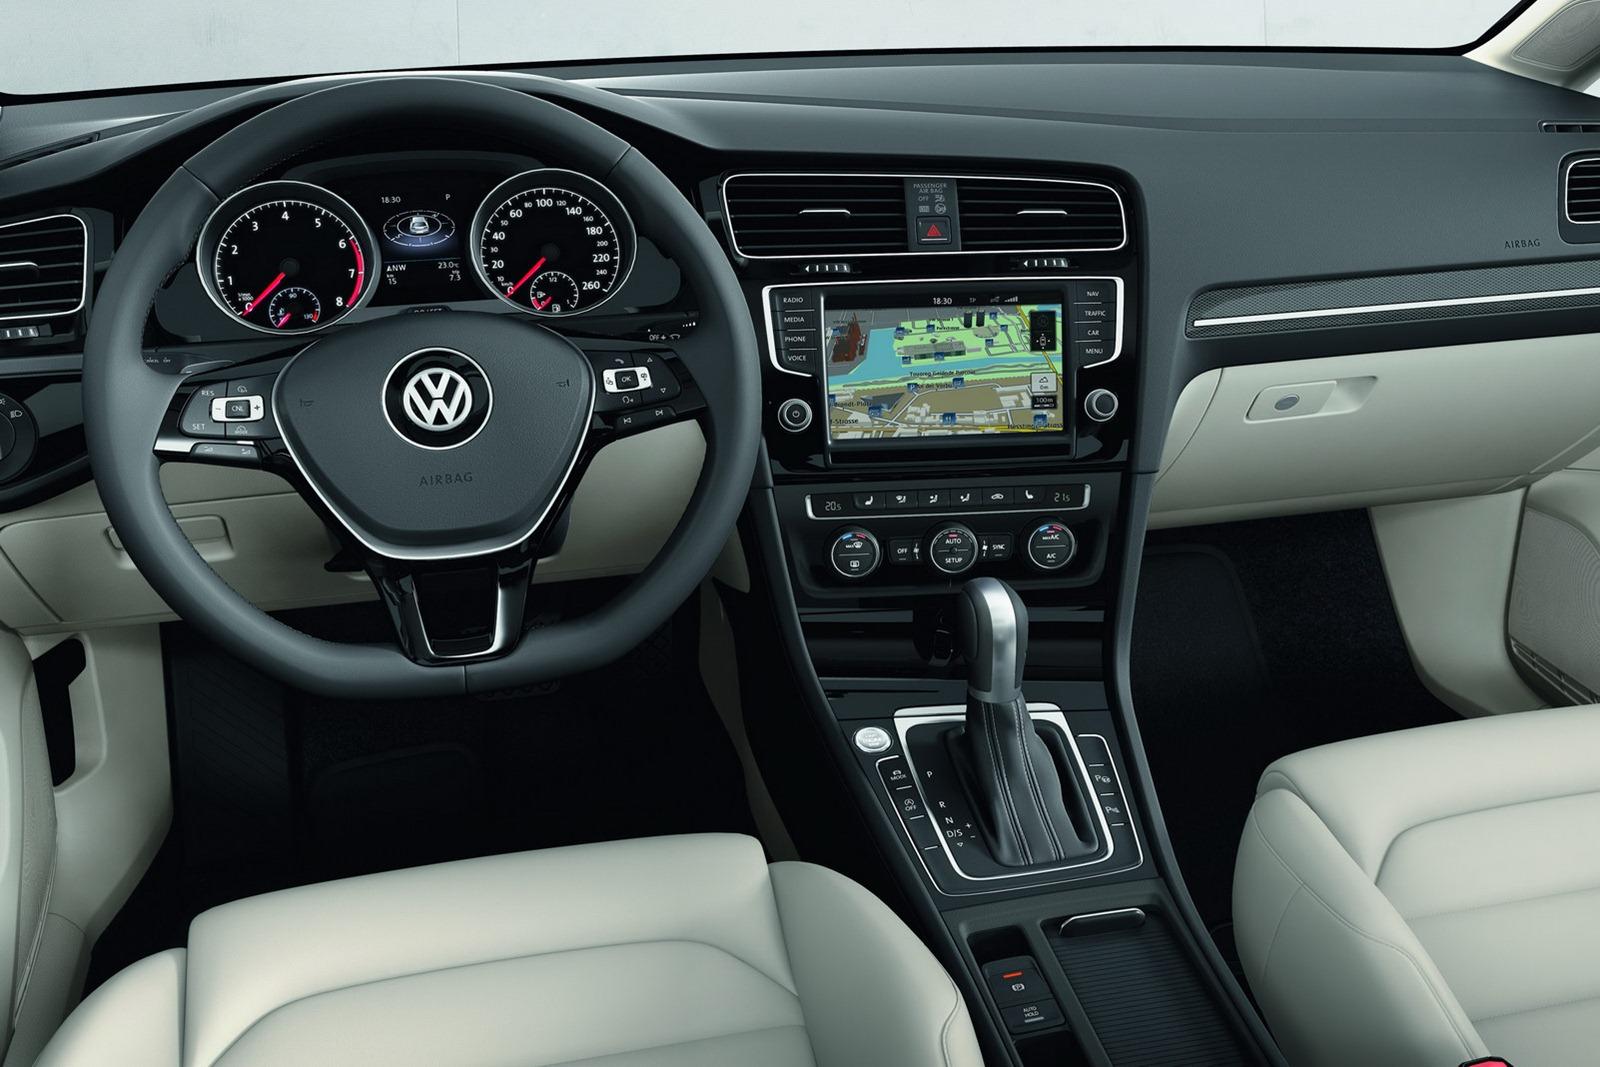 2013-vw-mk7-golf-interior-5